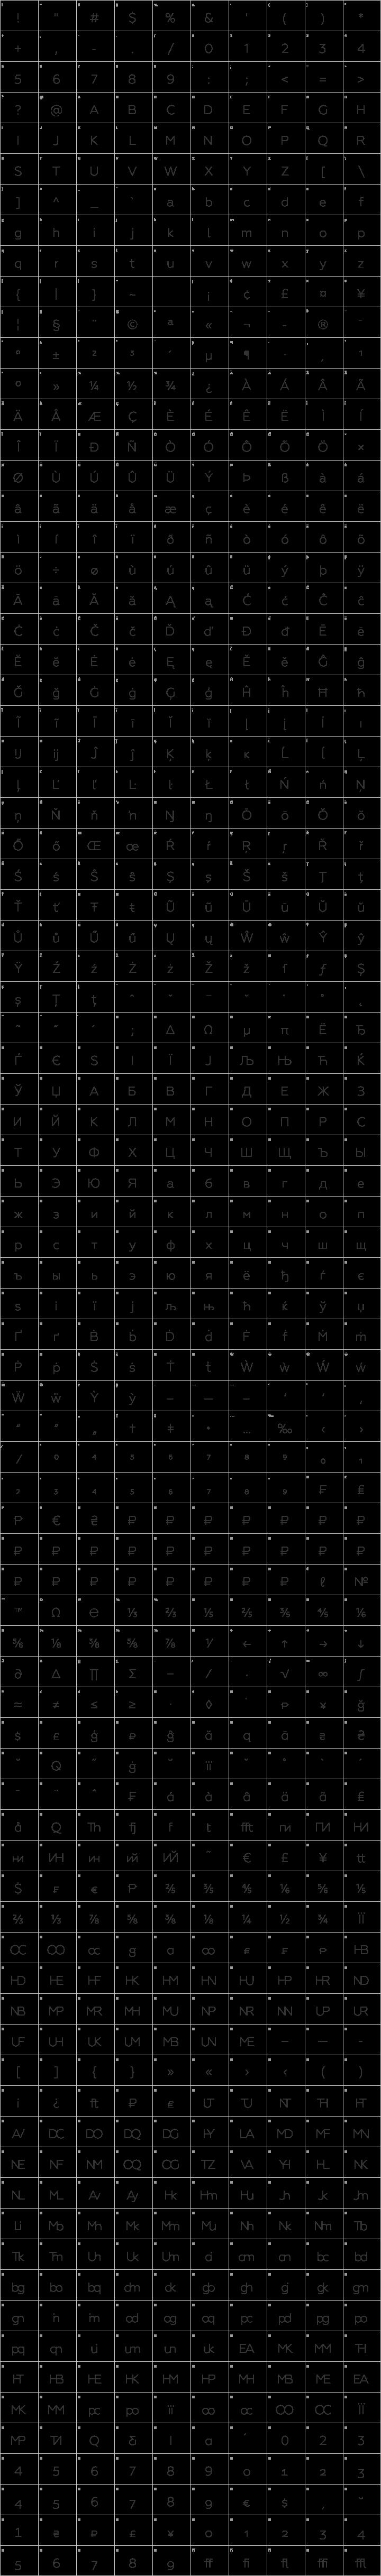 Geometria Glyph Map